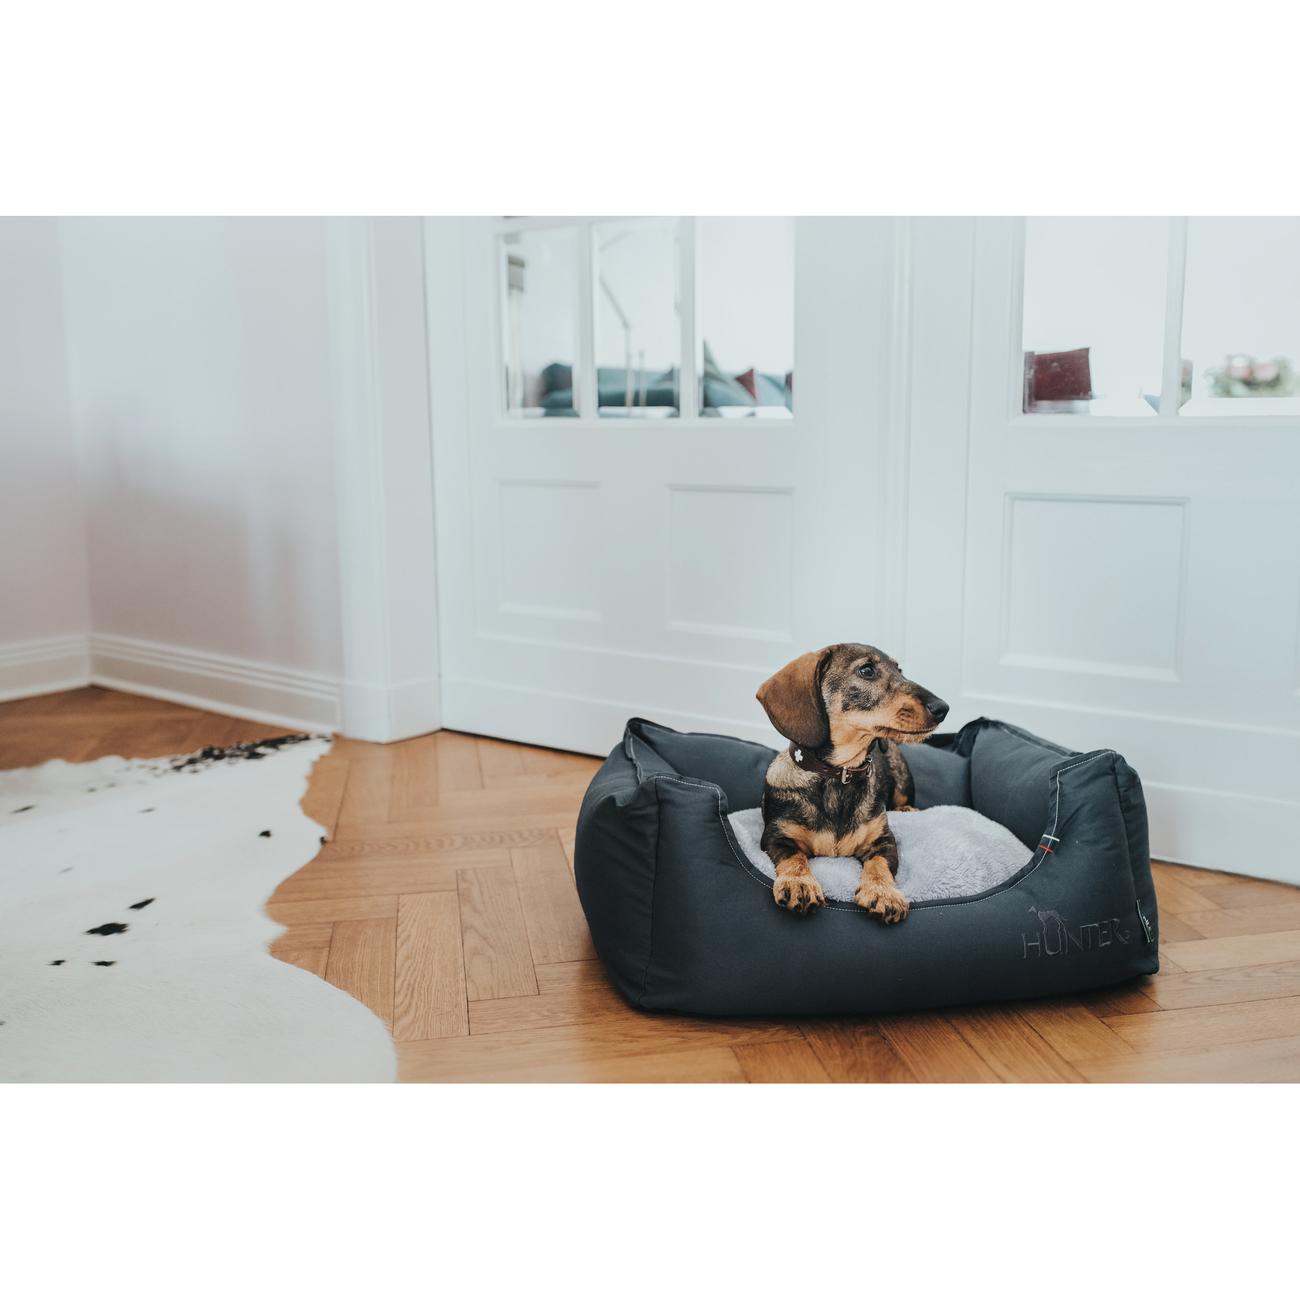 Hunter Hundesofa Sanremo 65105, Bild 6